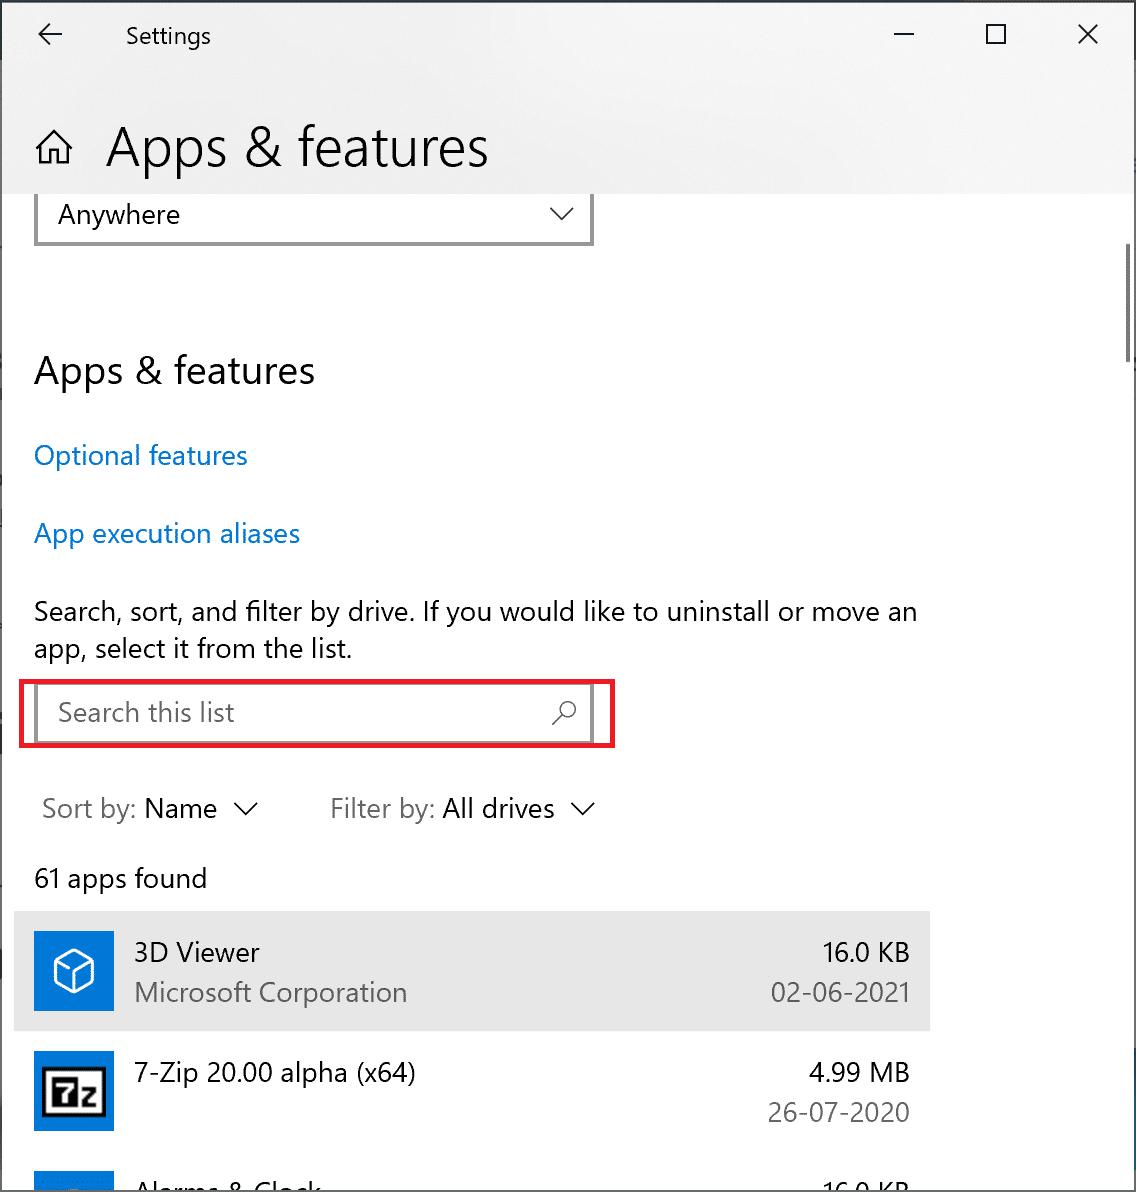 Type Destiny 2 into Search this list text box. How to Fix Destiny 2 Error Code Broccoli on Windows 10